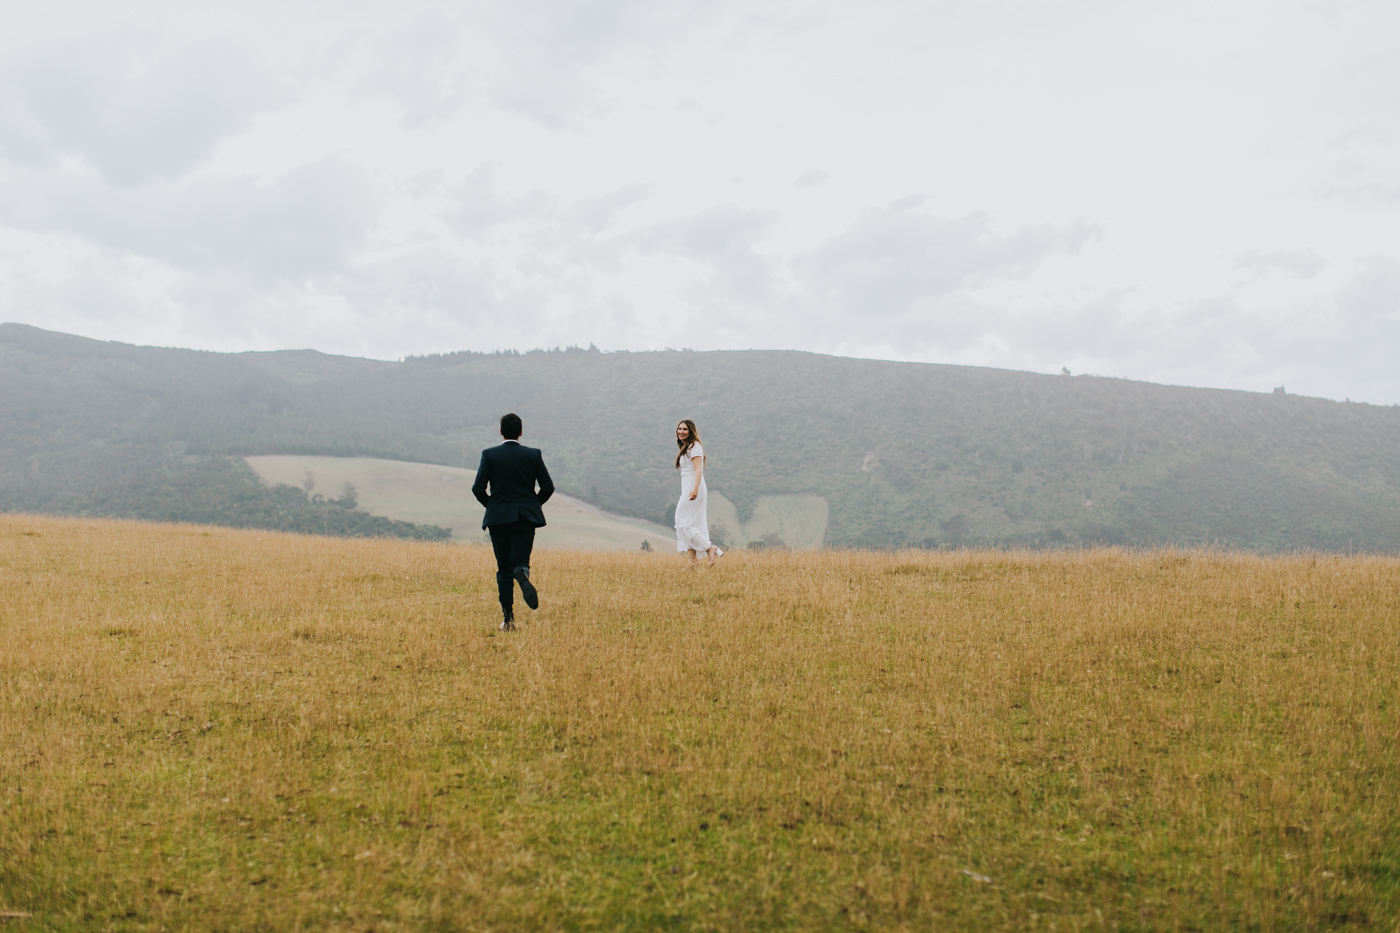 Ariana & Tim - Dunedin, New Zealand Wedding - Destination Wedding - Samantha Heather Photography-197.jpg